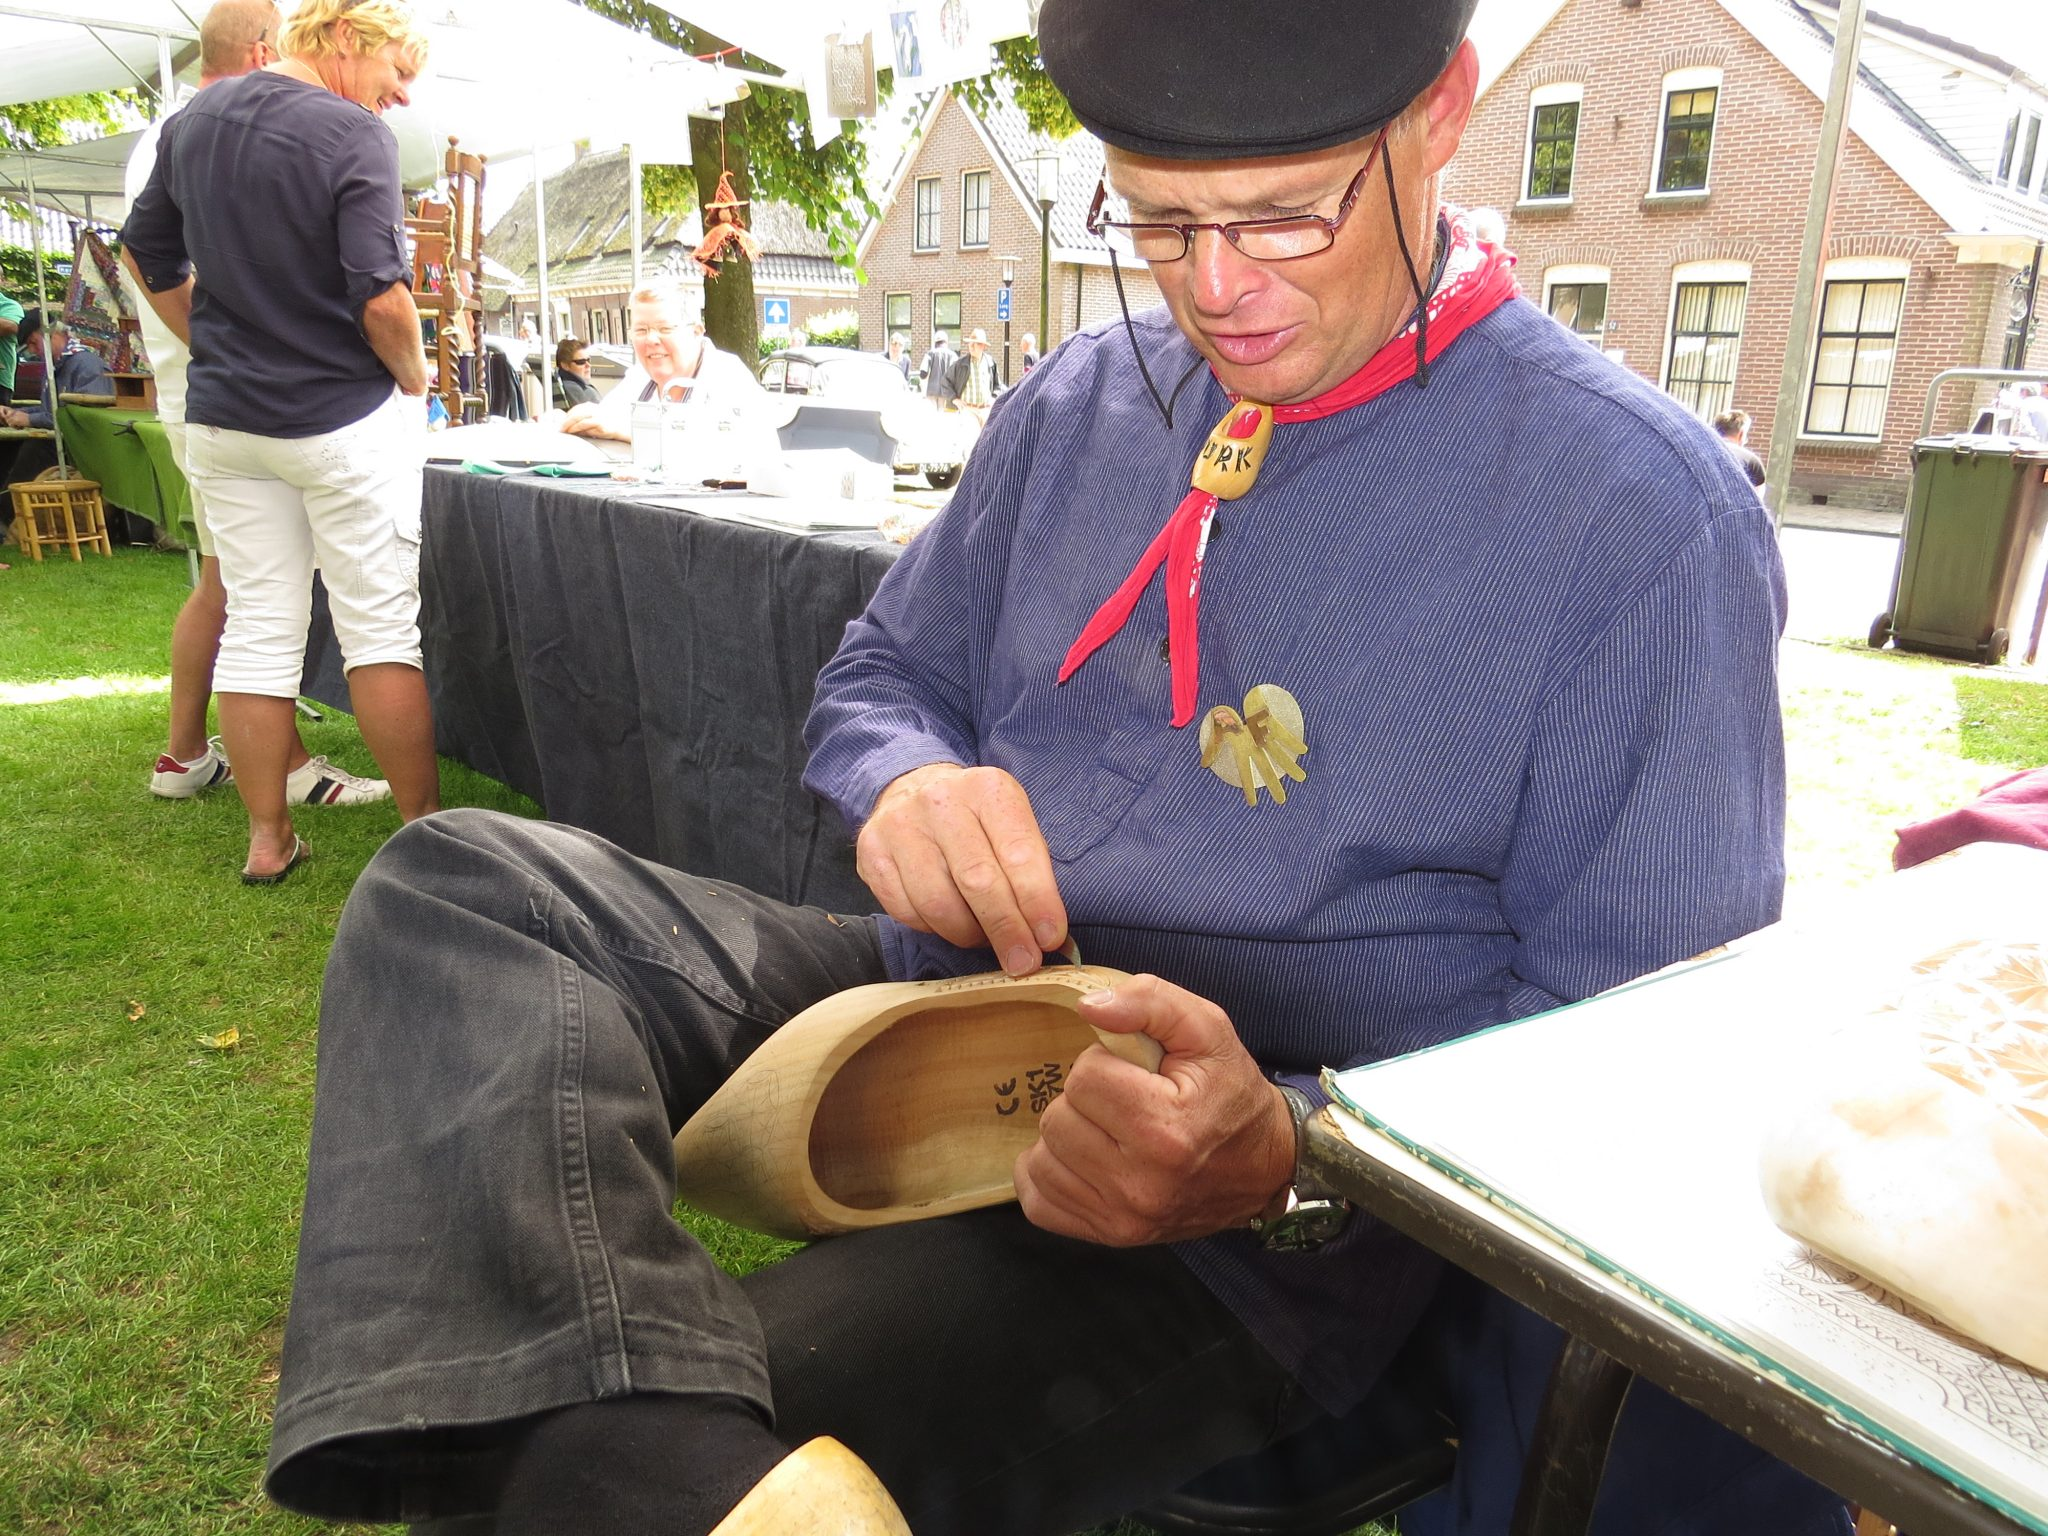 Dirk Wierstra